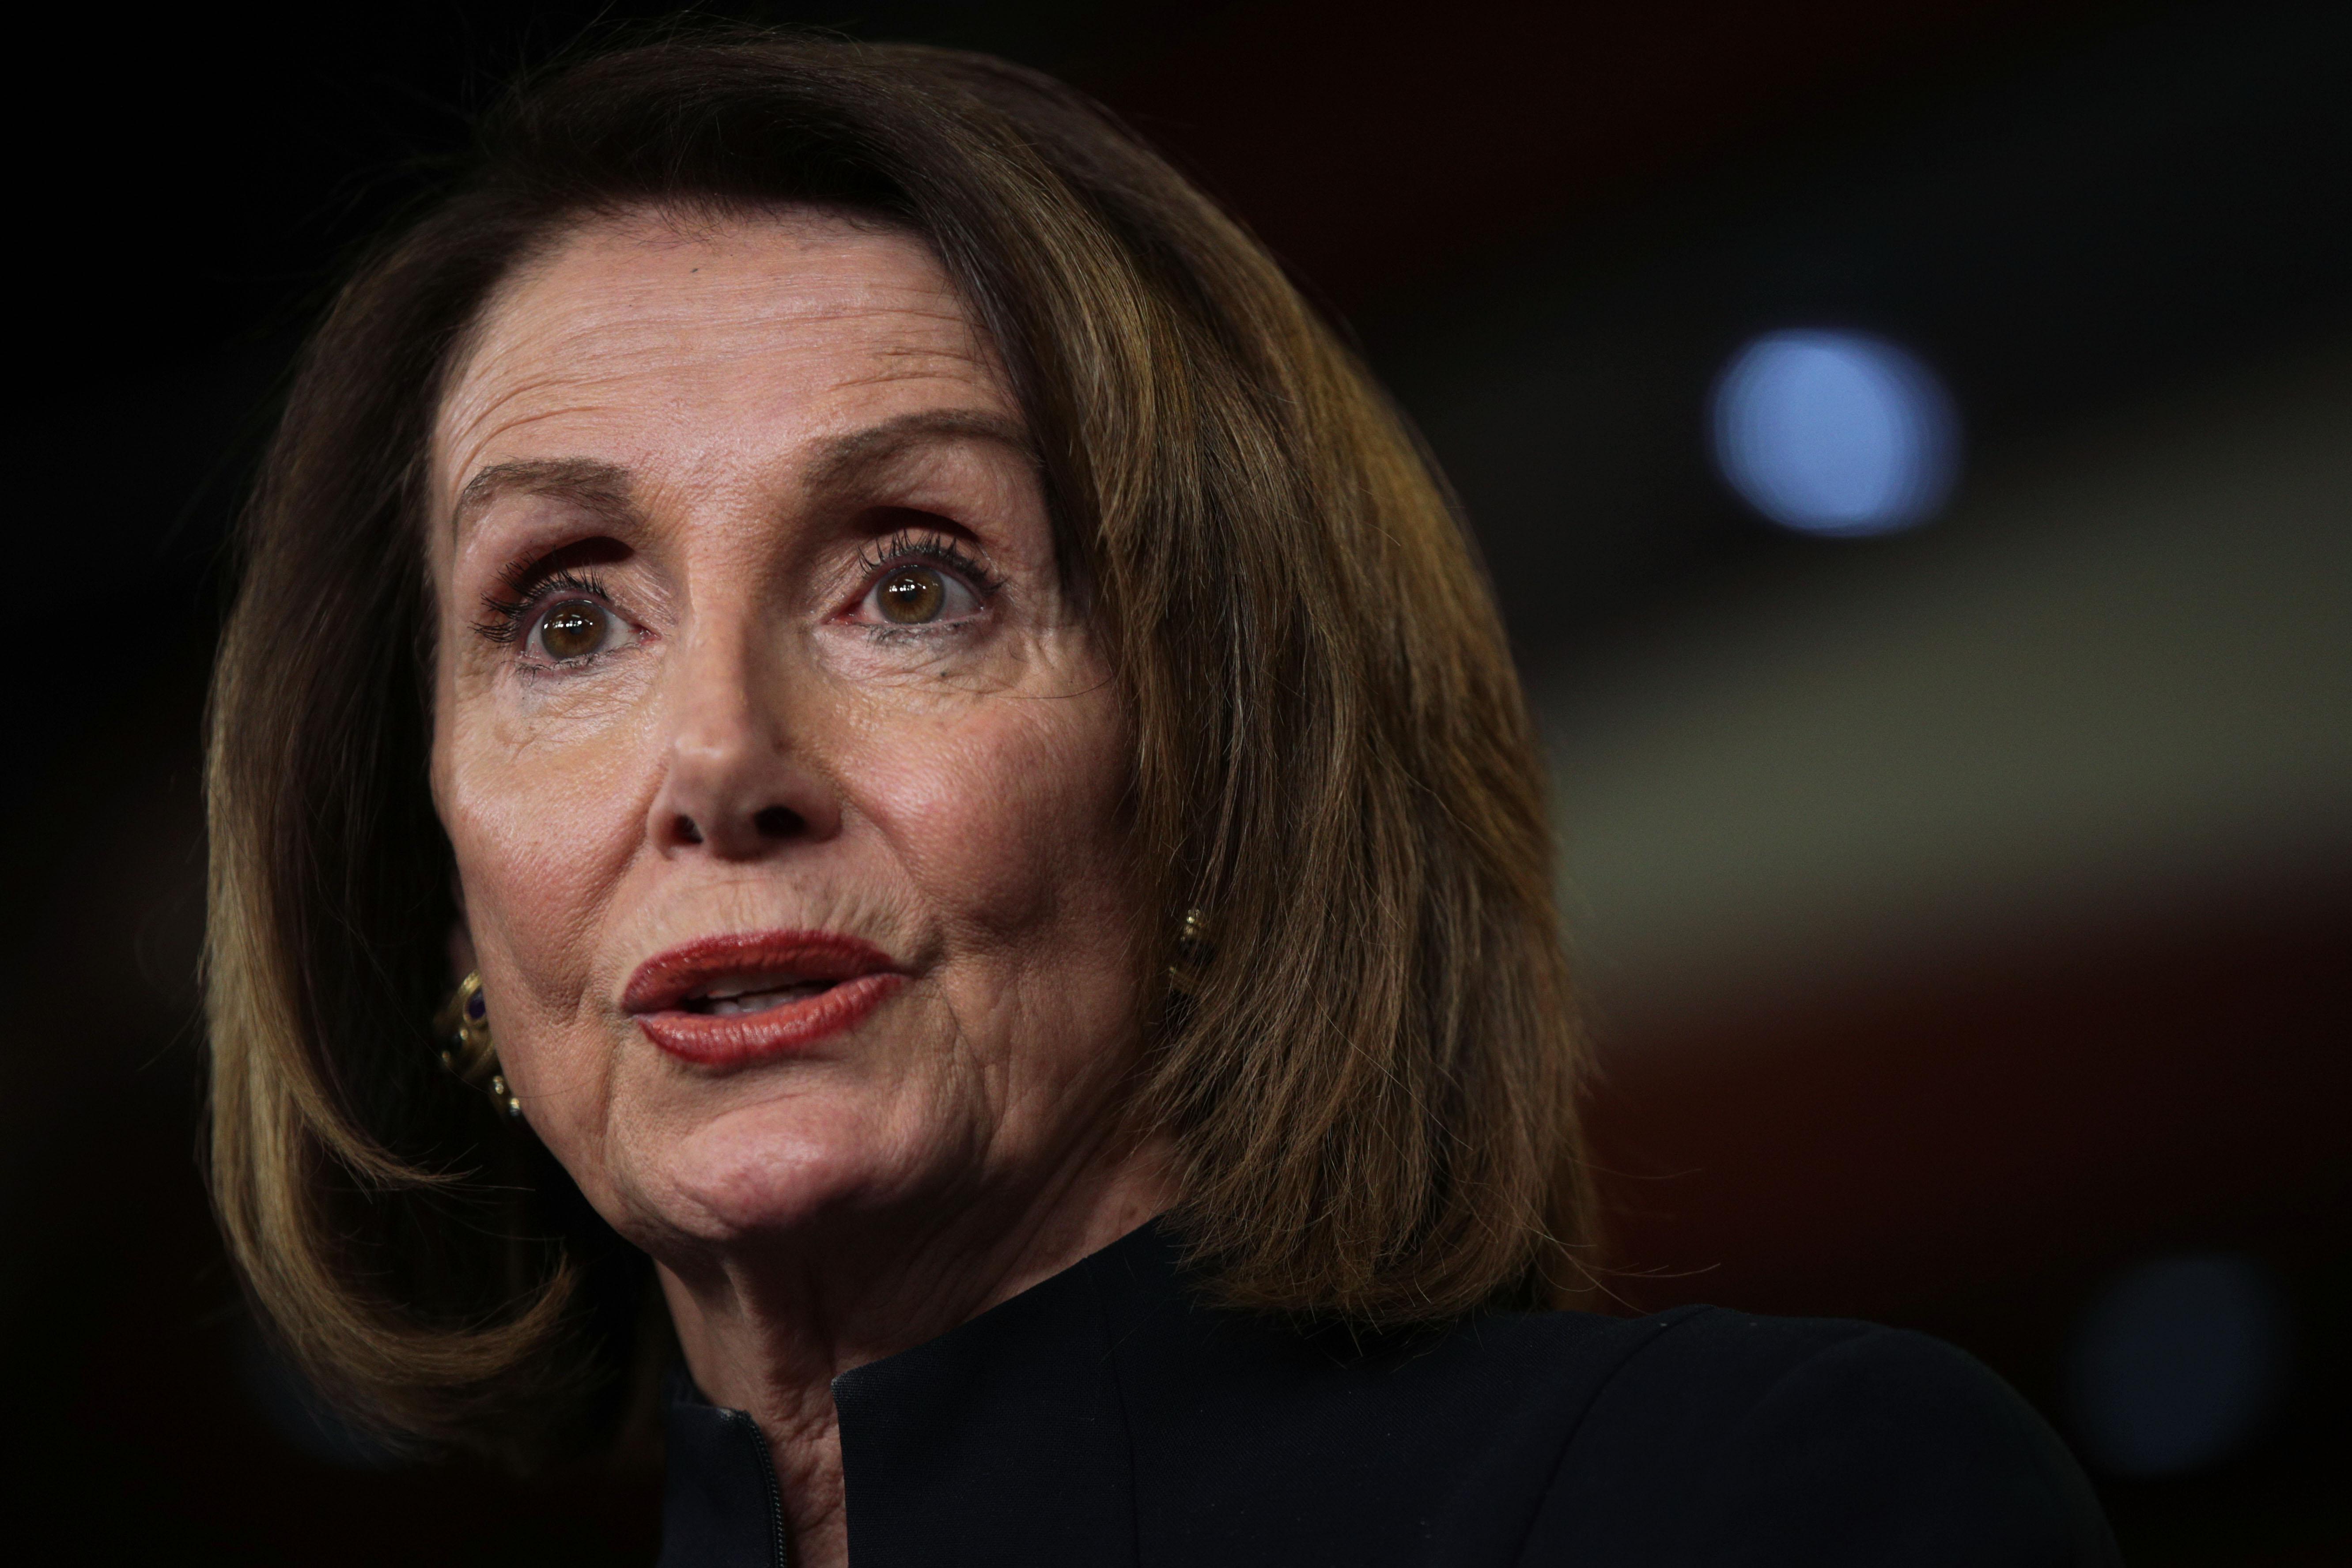 Nancy Pelosi: Mueller report briefings to Congress should be unclassified